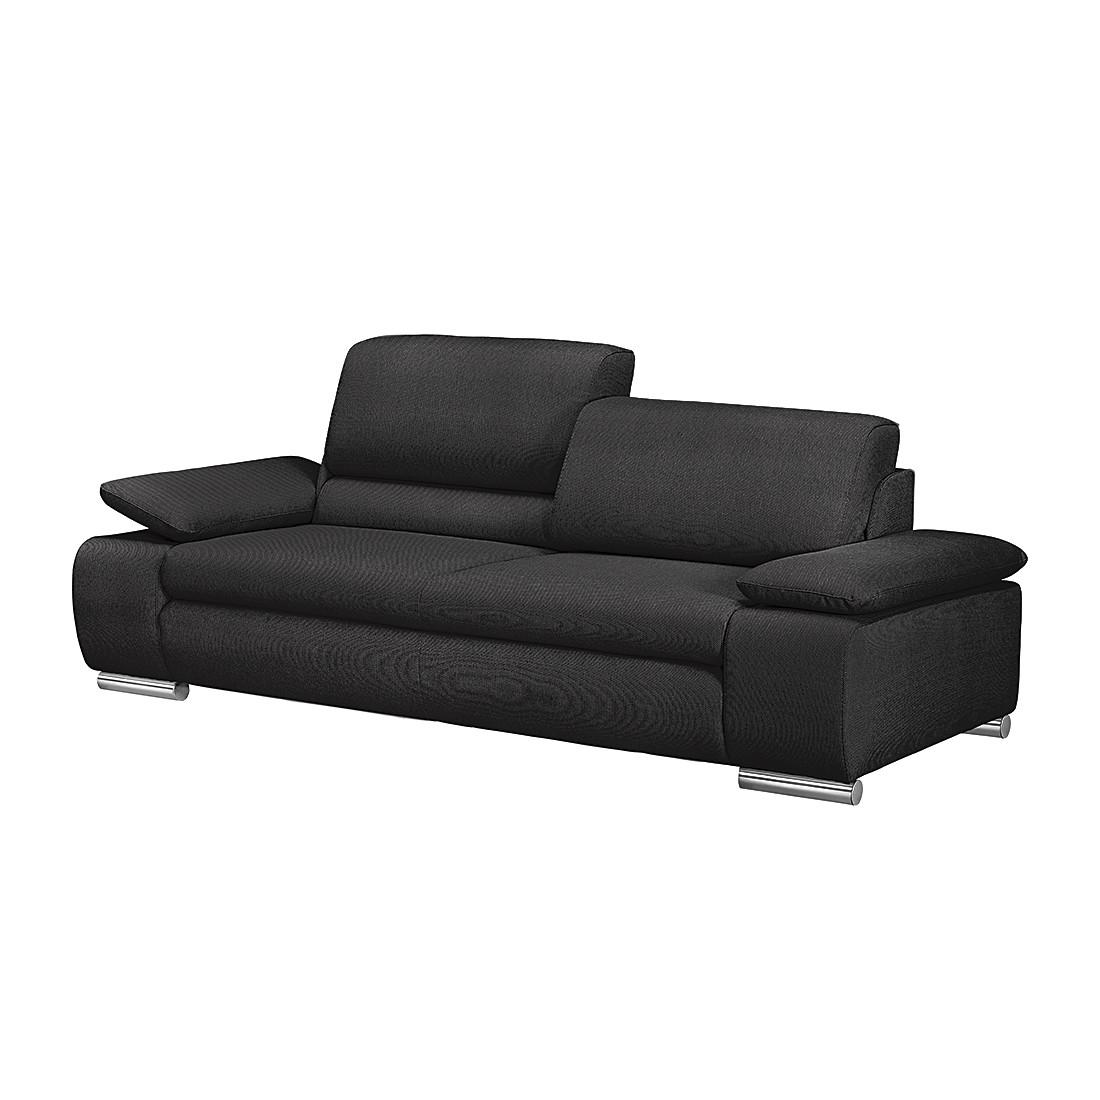 Sofa Masca (2-Sitzer) – Strukturstoff Anthrazit, loftscape bestellen